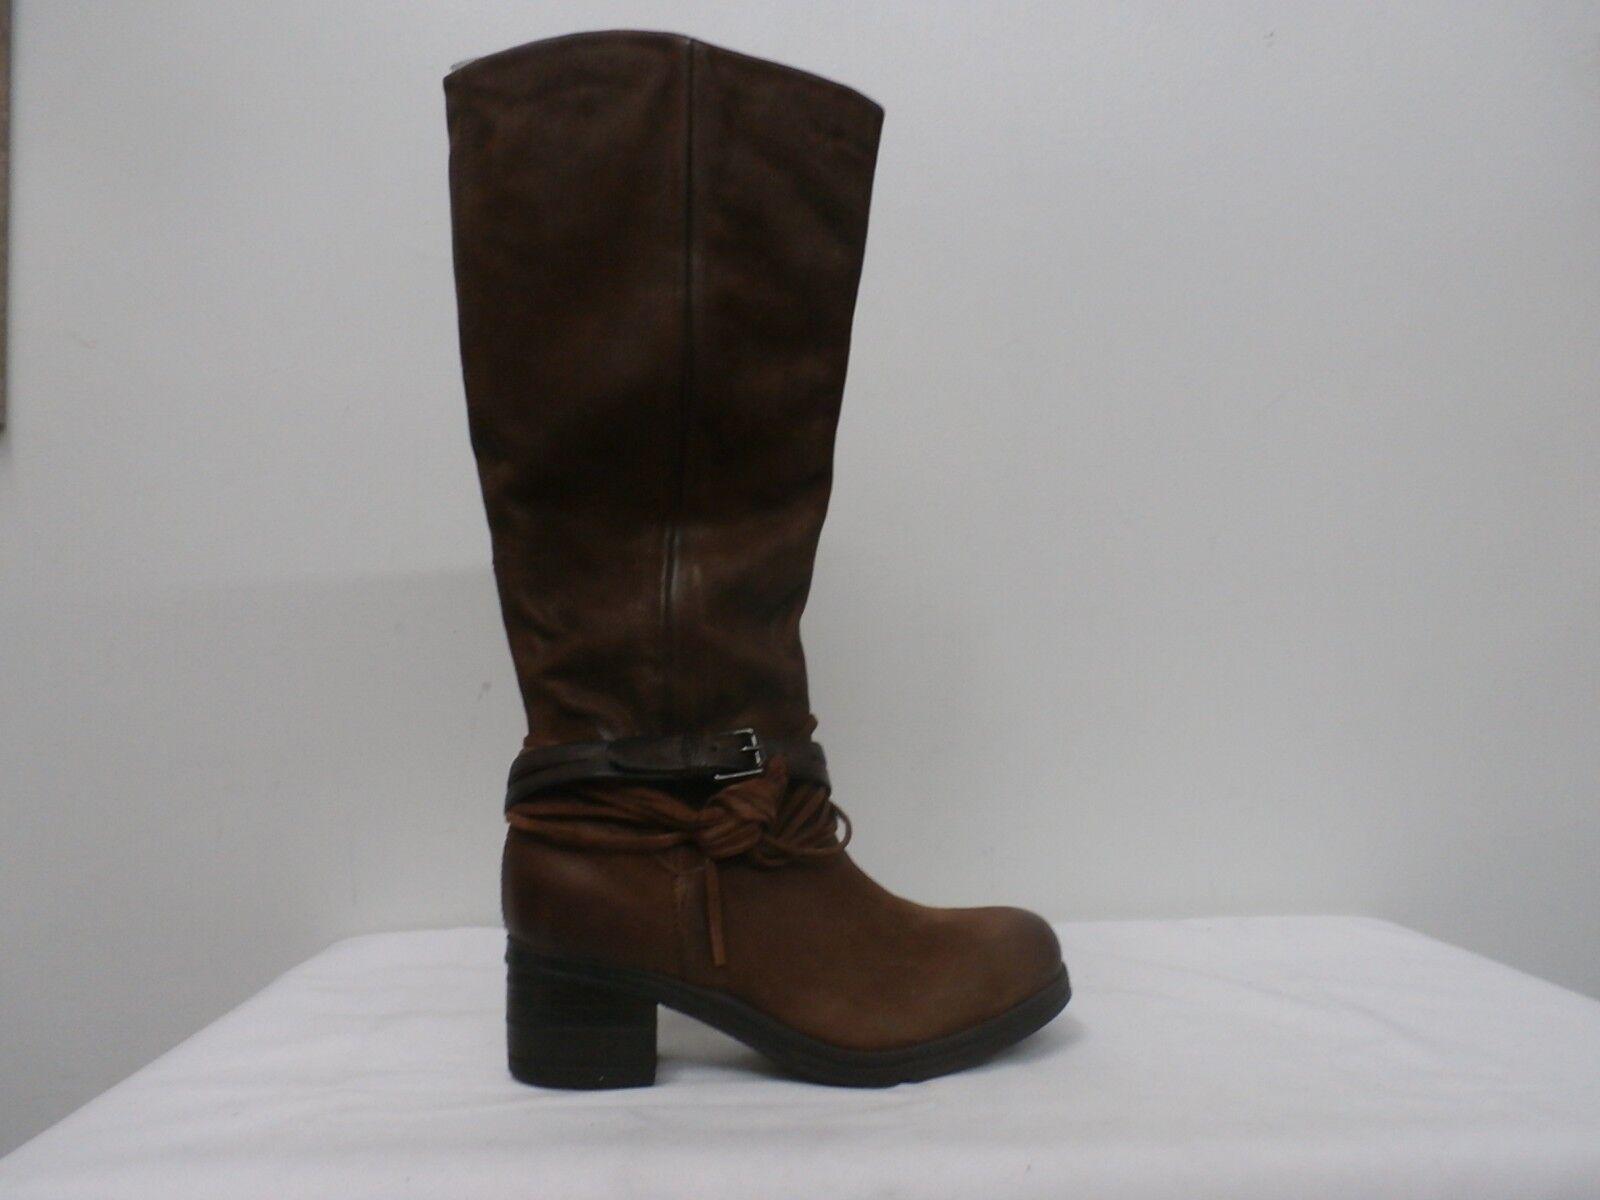 Miz Mooz Leather Tall Shaft stivali - Sugar Brandy 38(7.5-8)